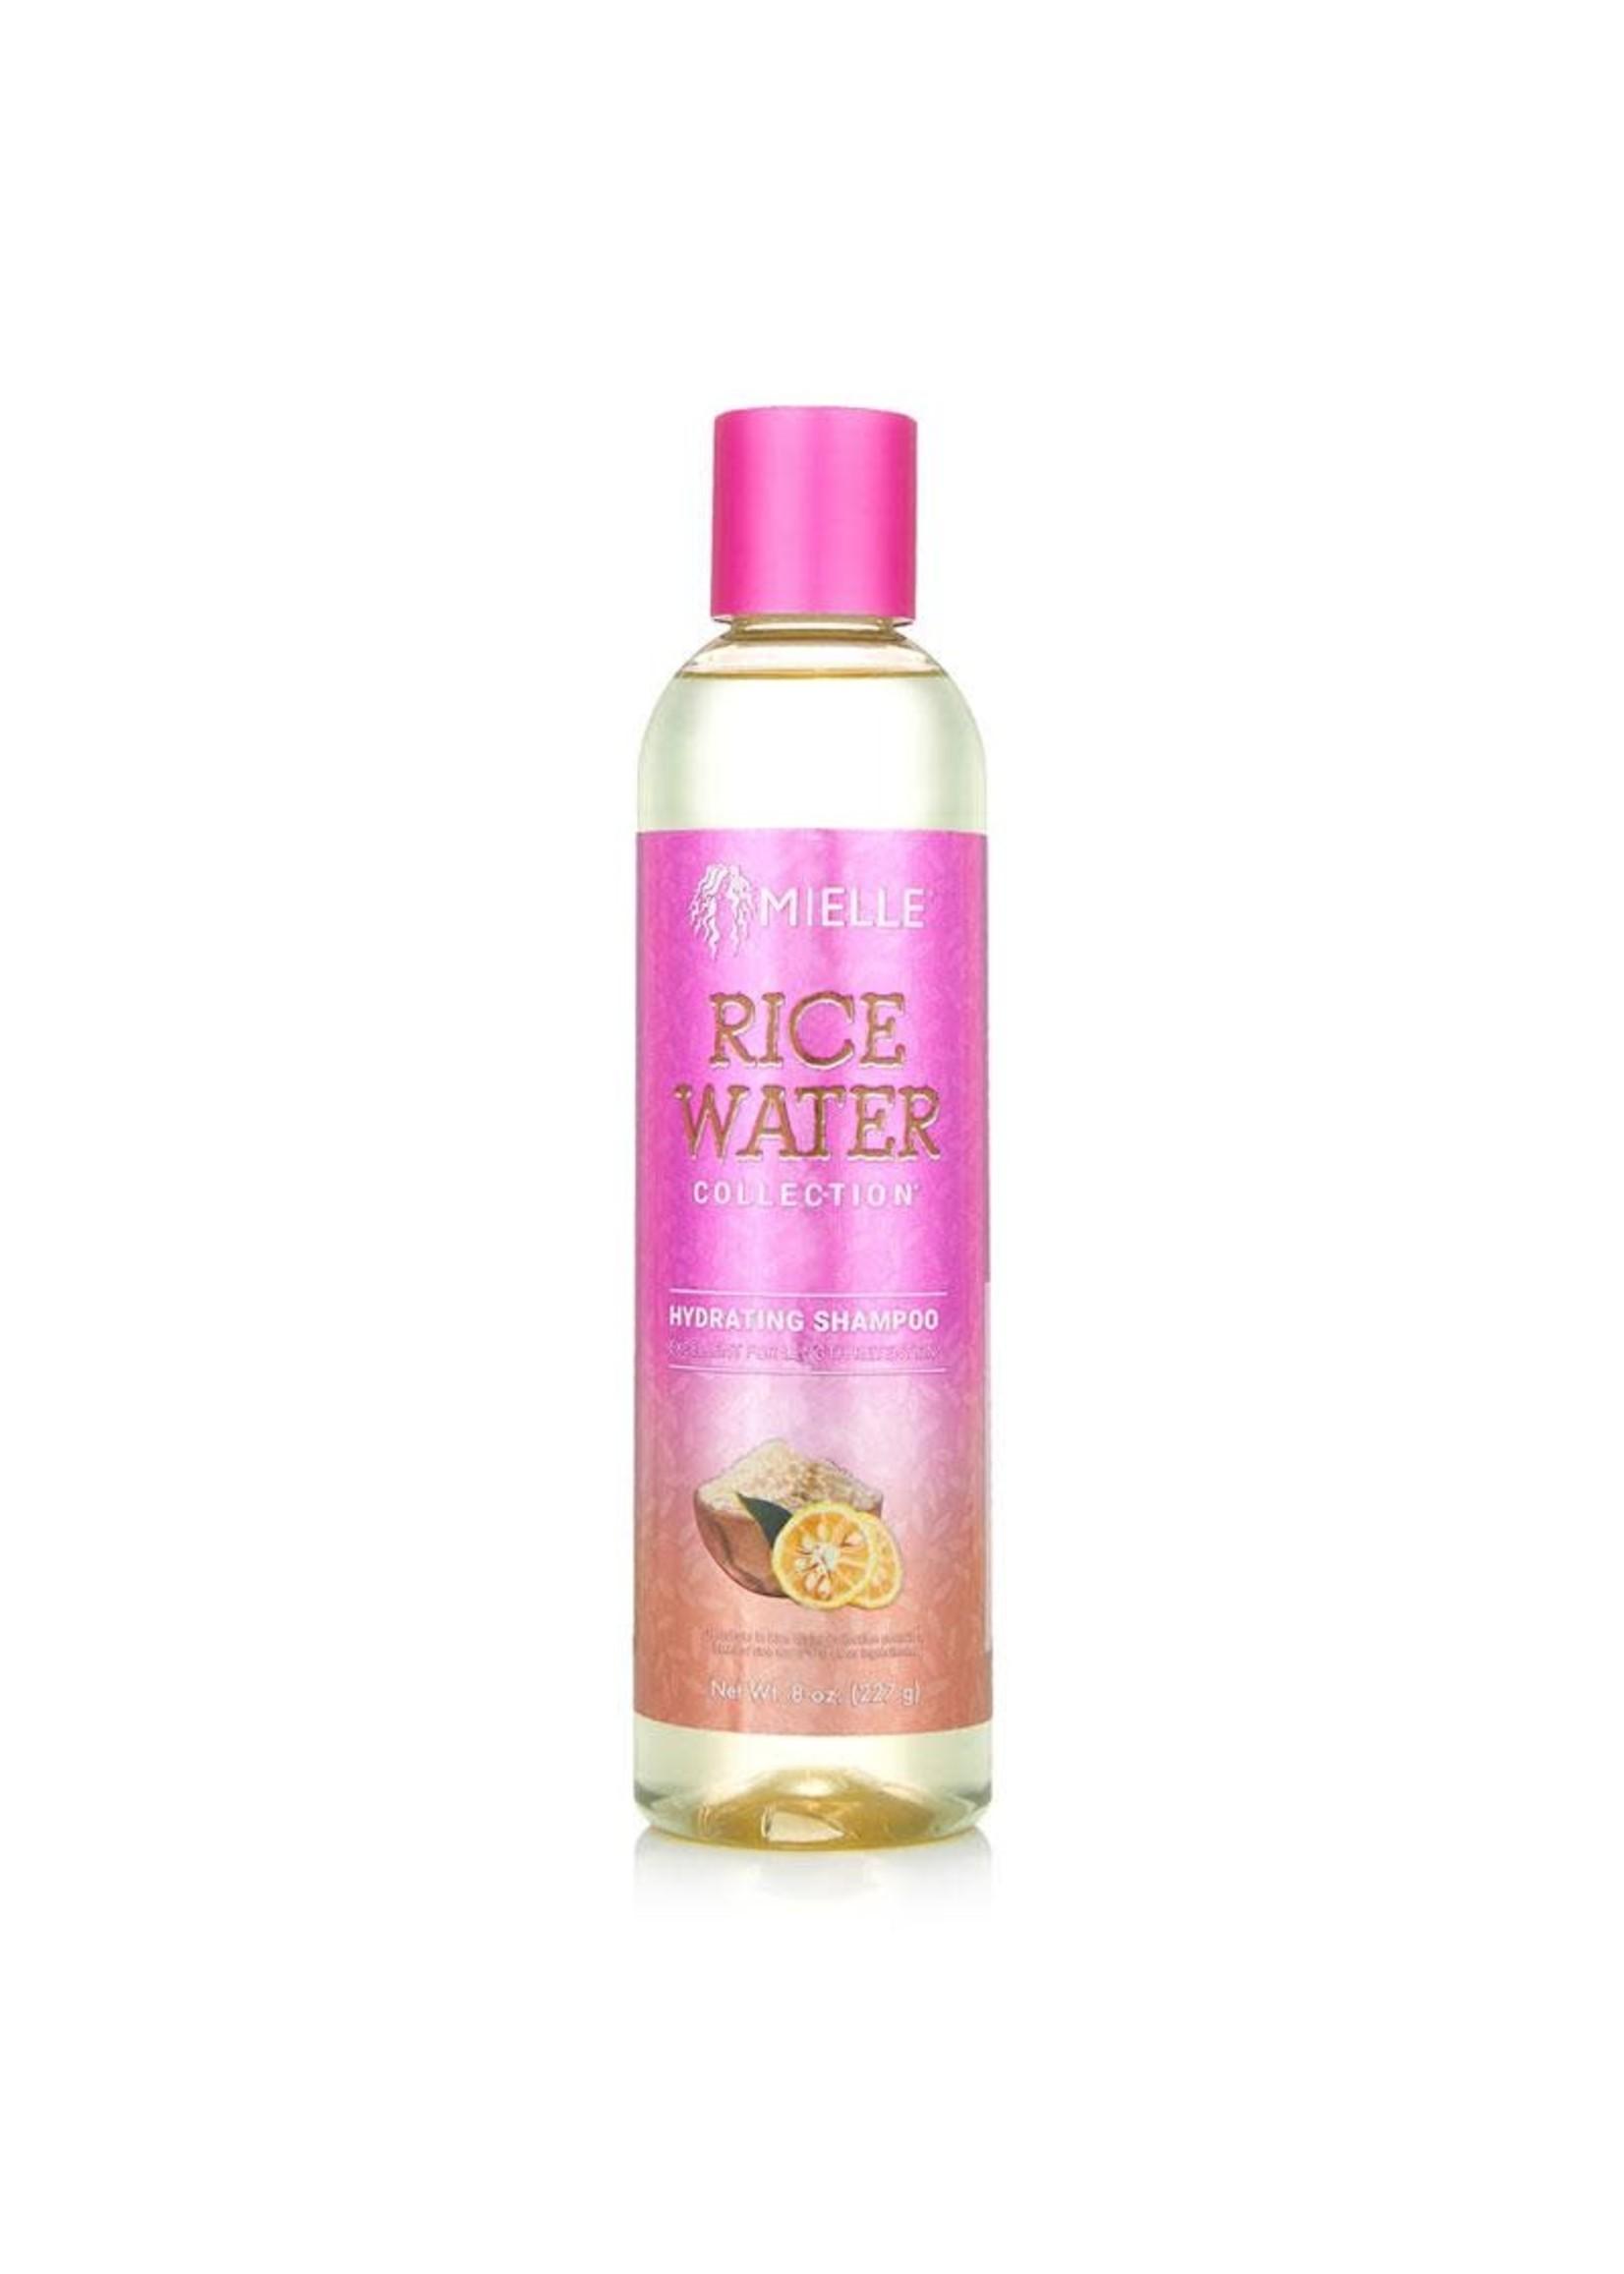 Mielle Rice Water Hydrating Shampoo